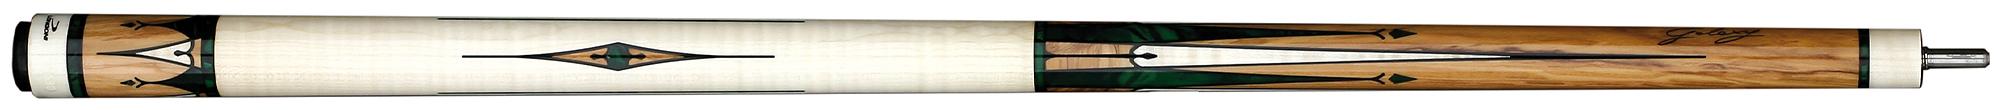 CK0896-GM: Longoni Galaxy Maple #1